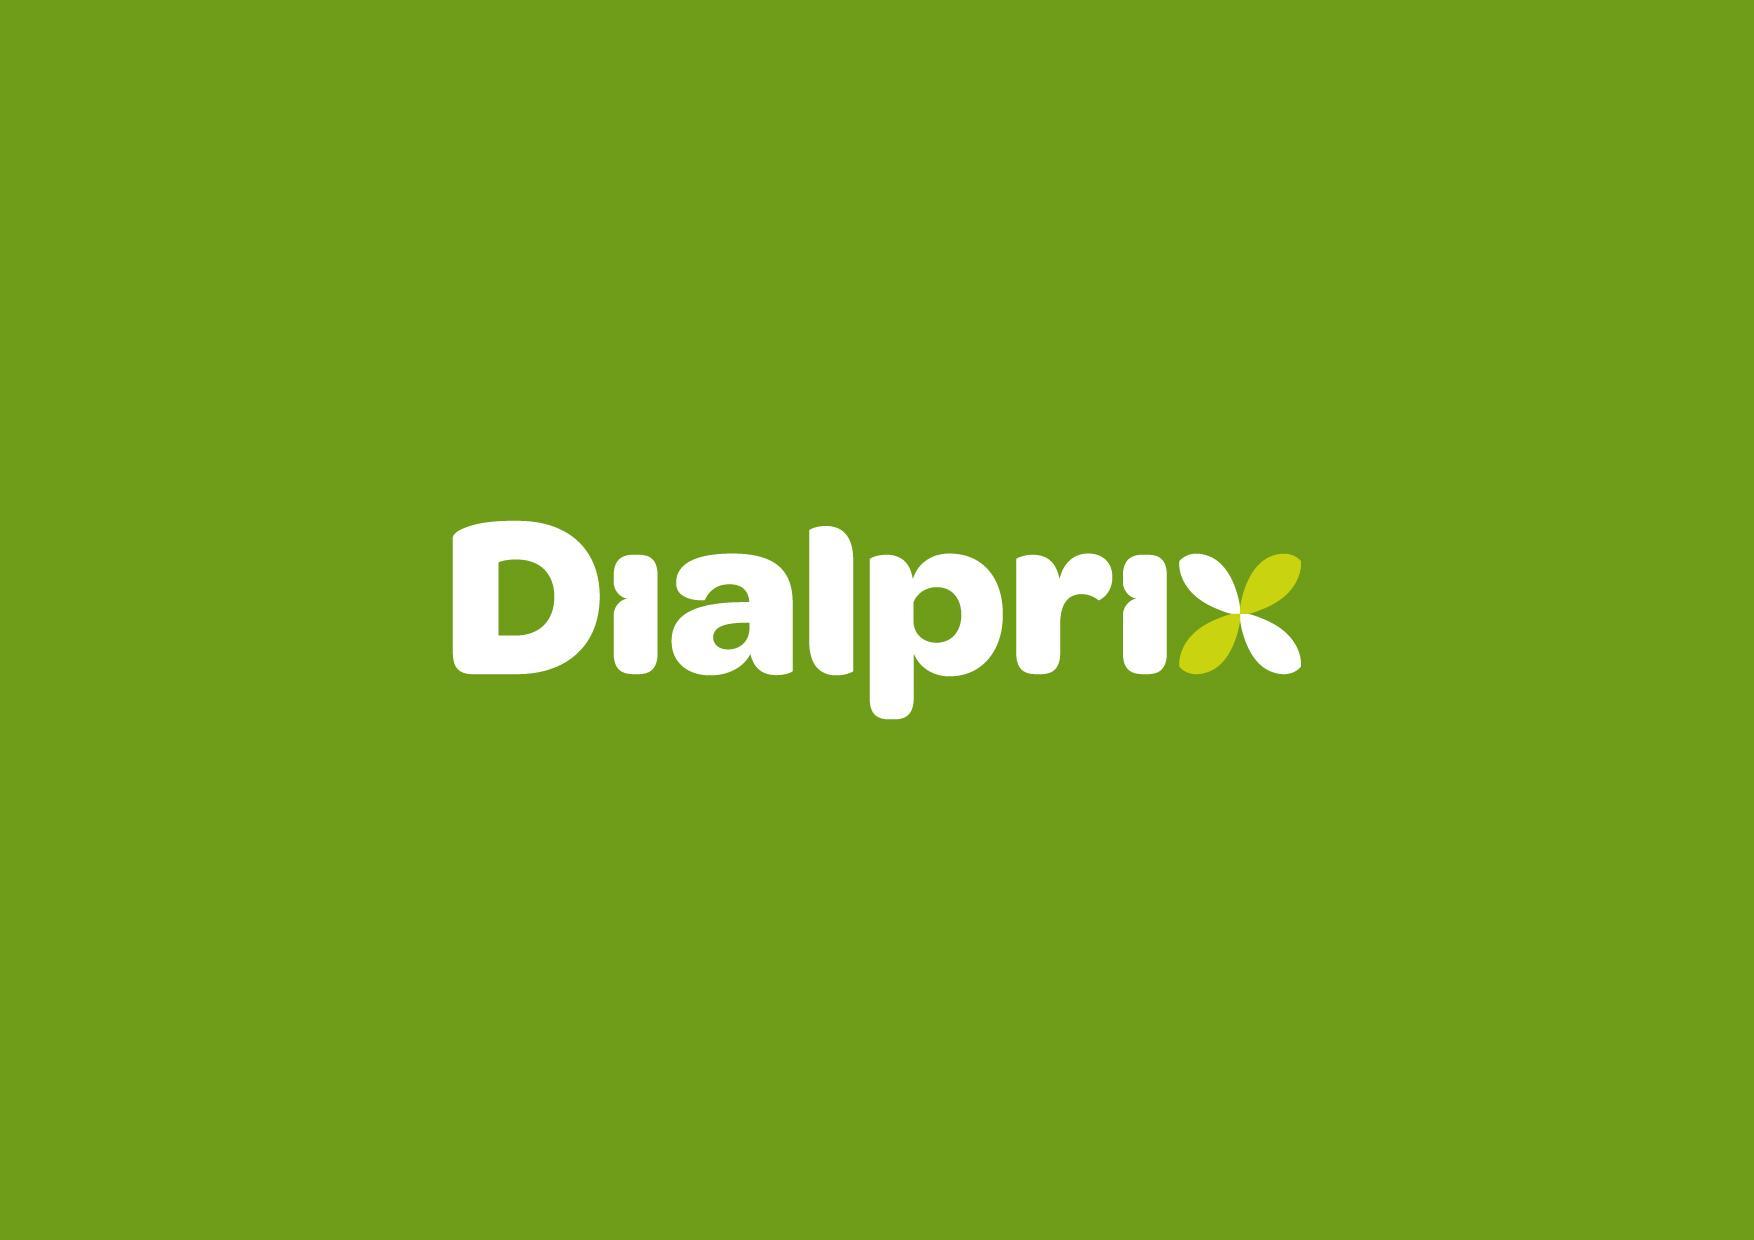 Dialprix abre supermercado en San Miguel de Abona